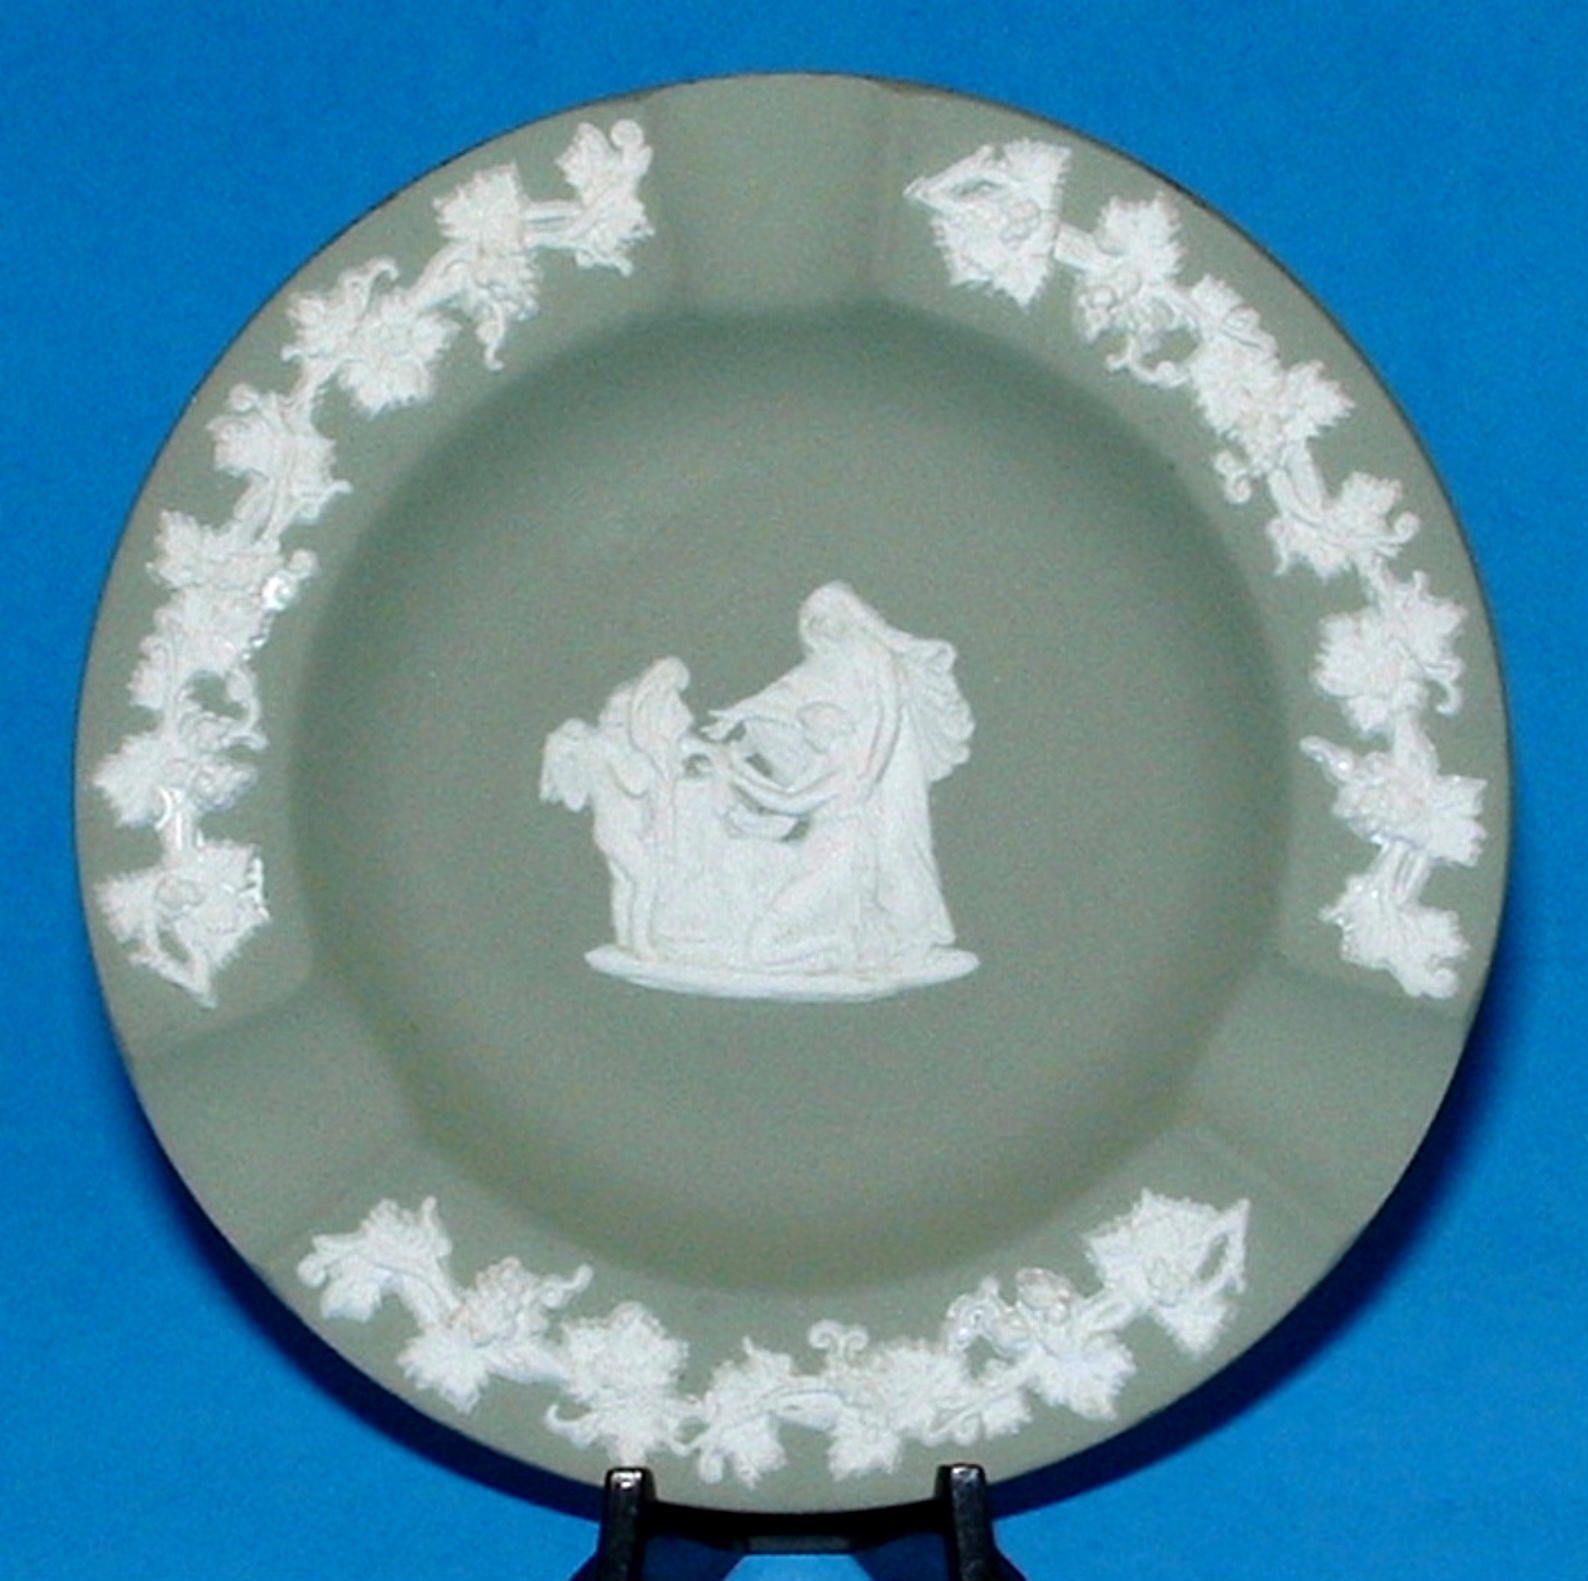 4 Pieces Wedgewood England Small Dish /& Ash Trays Jasperware Chariot